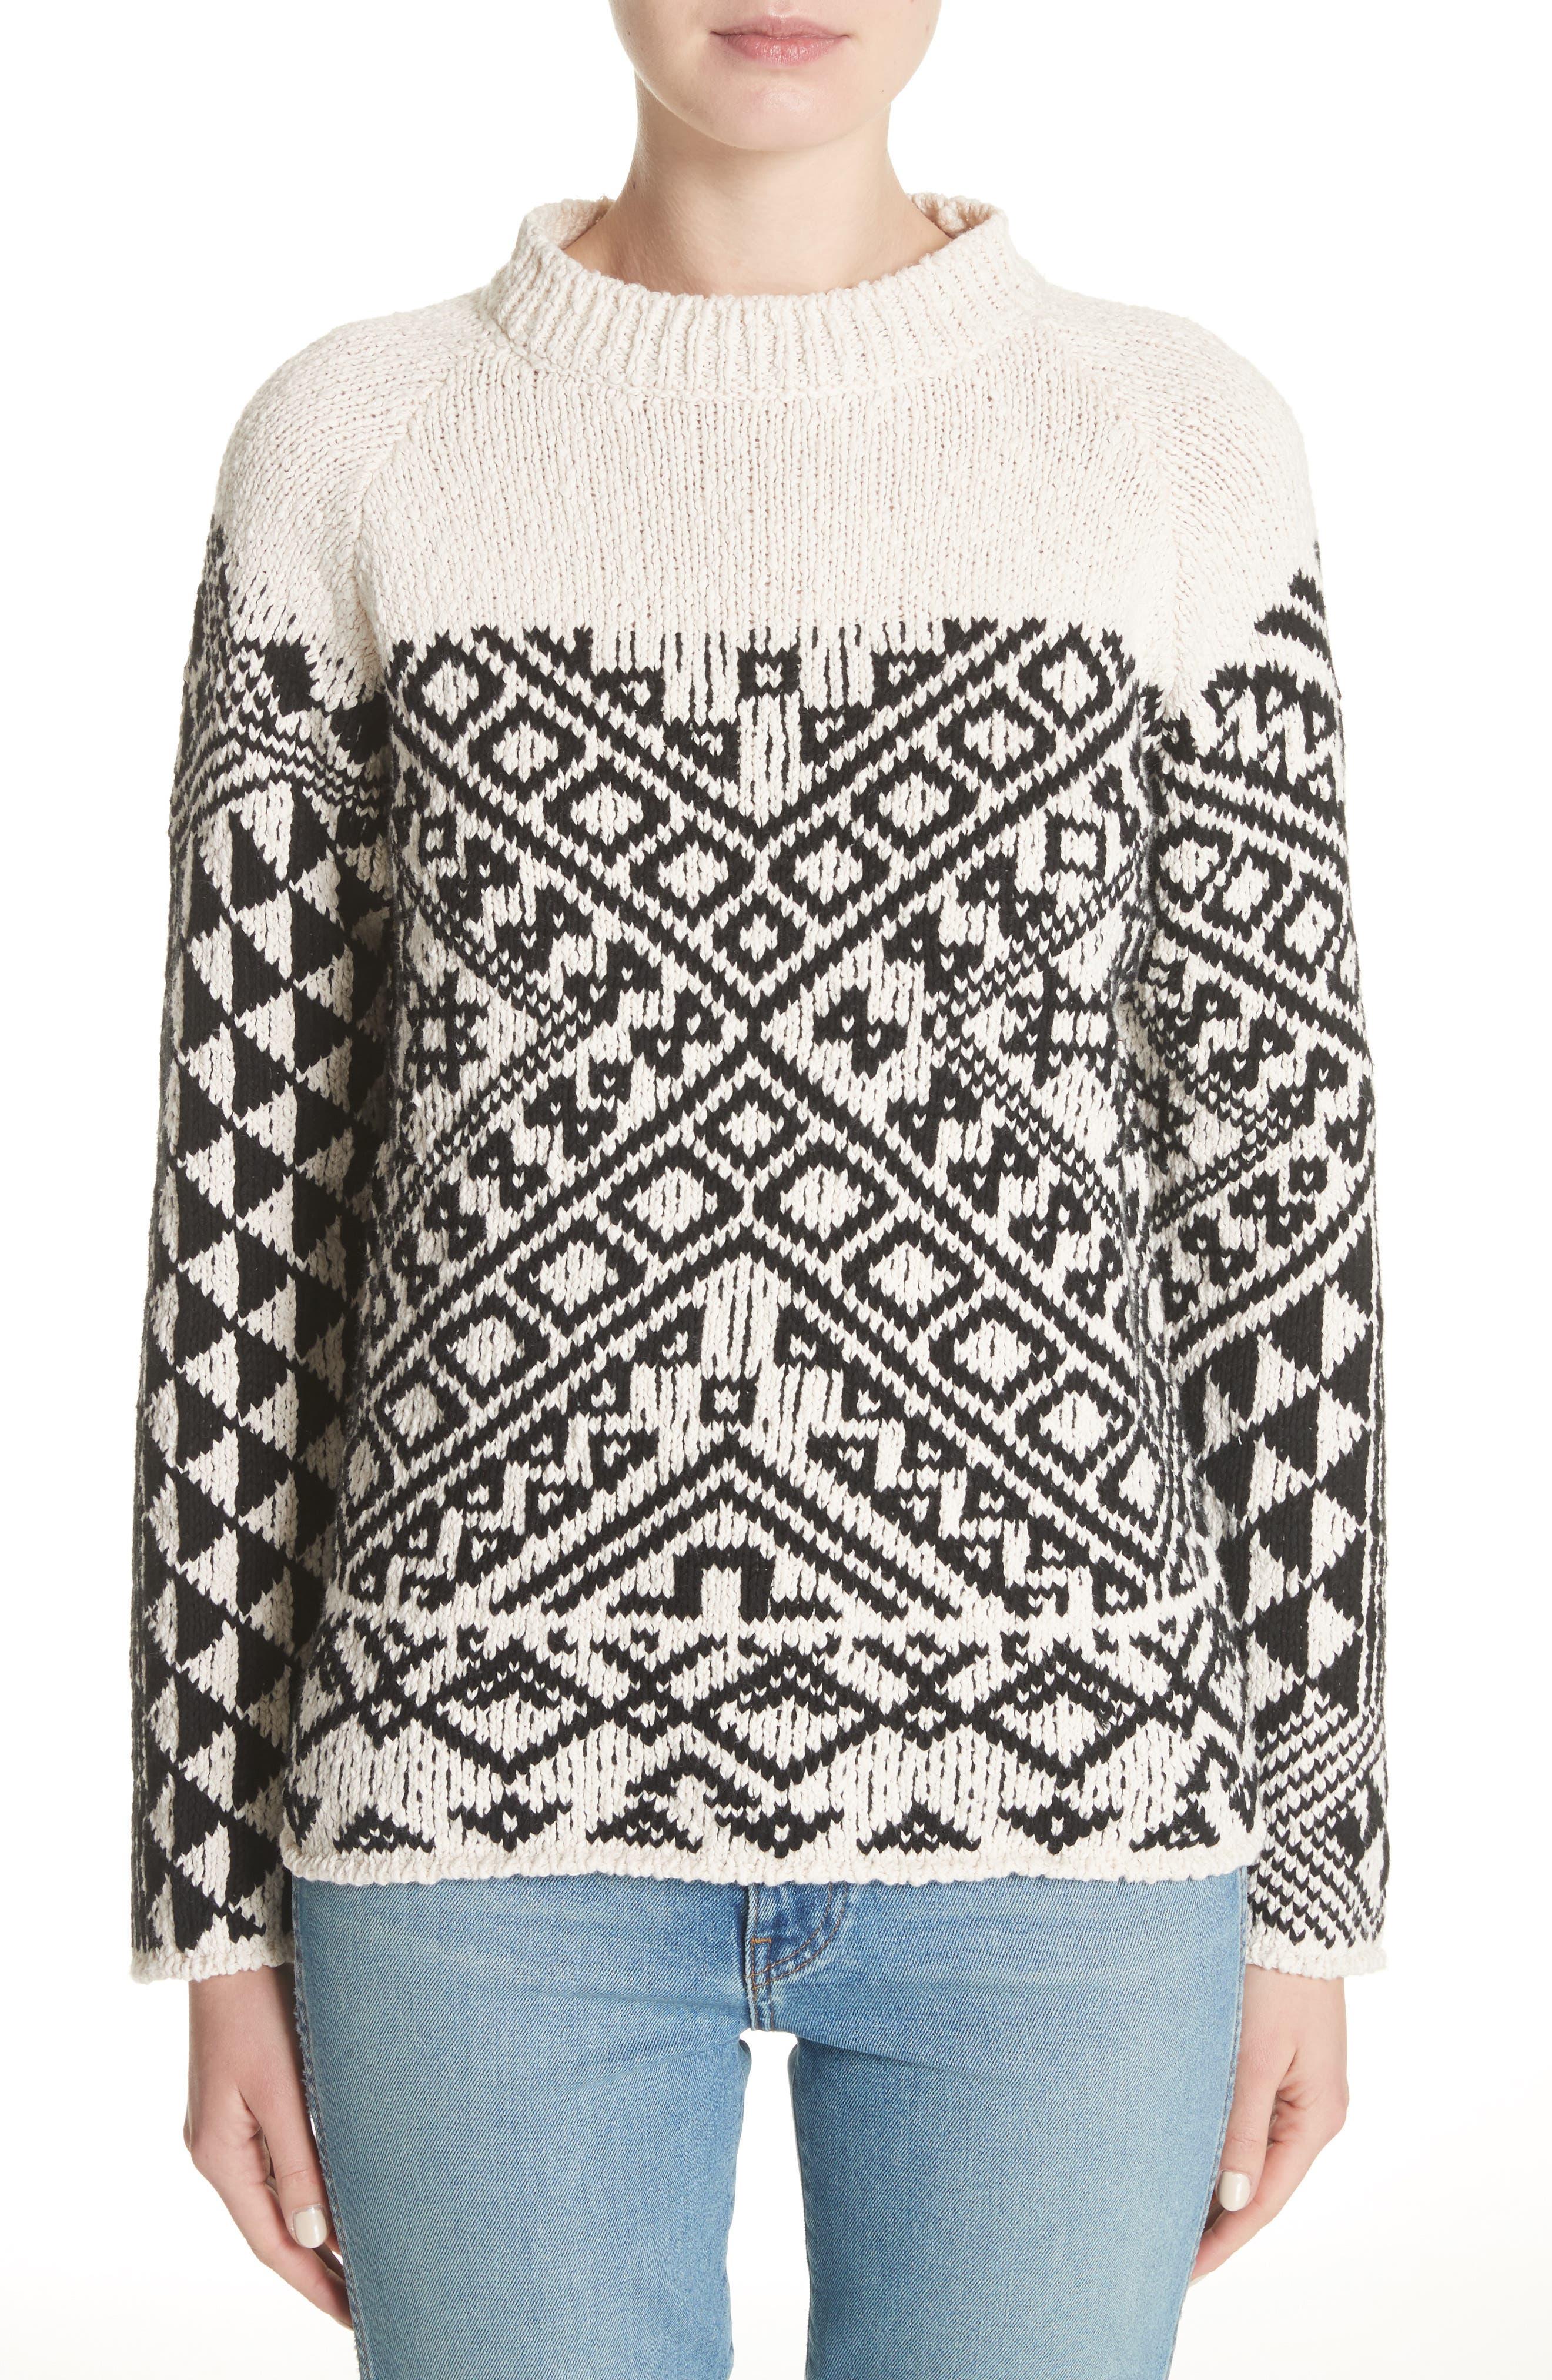 Rhia Jacquard Sweater,                         Main,                         color, Off White/ Black